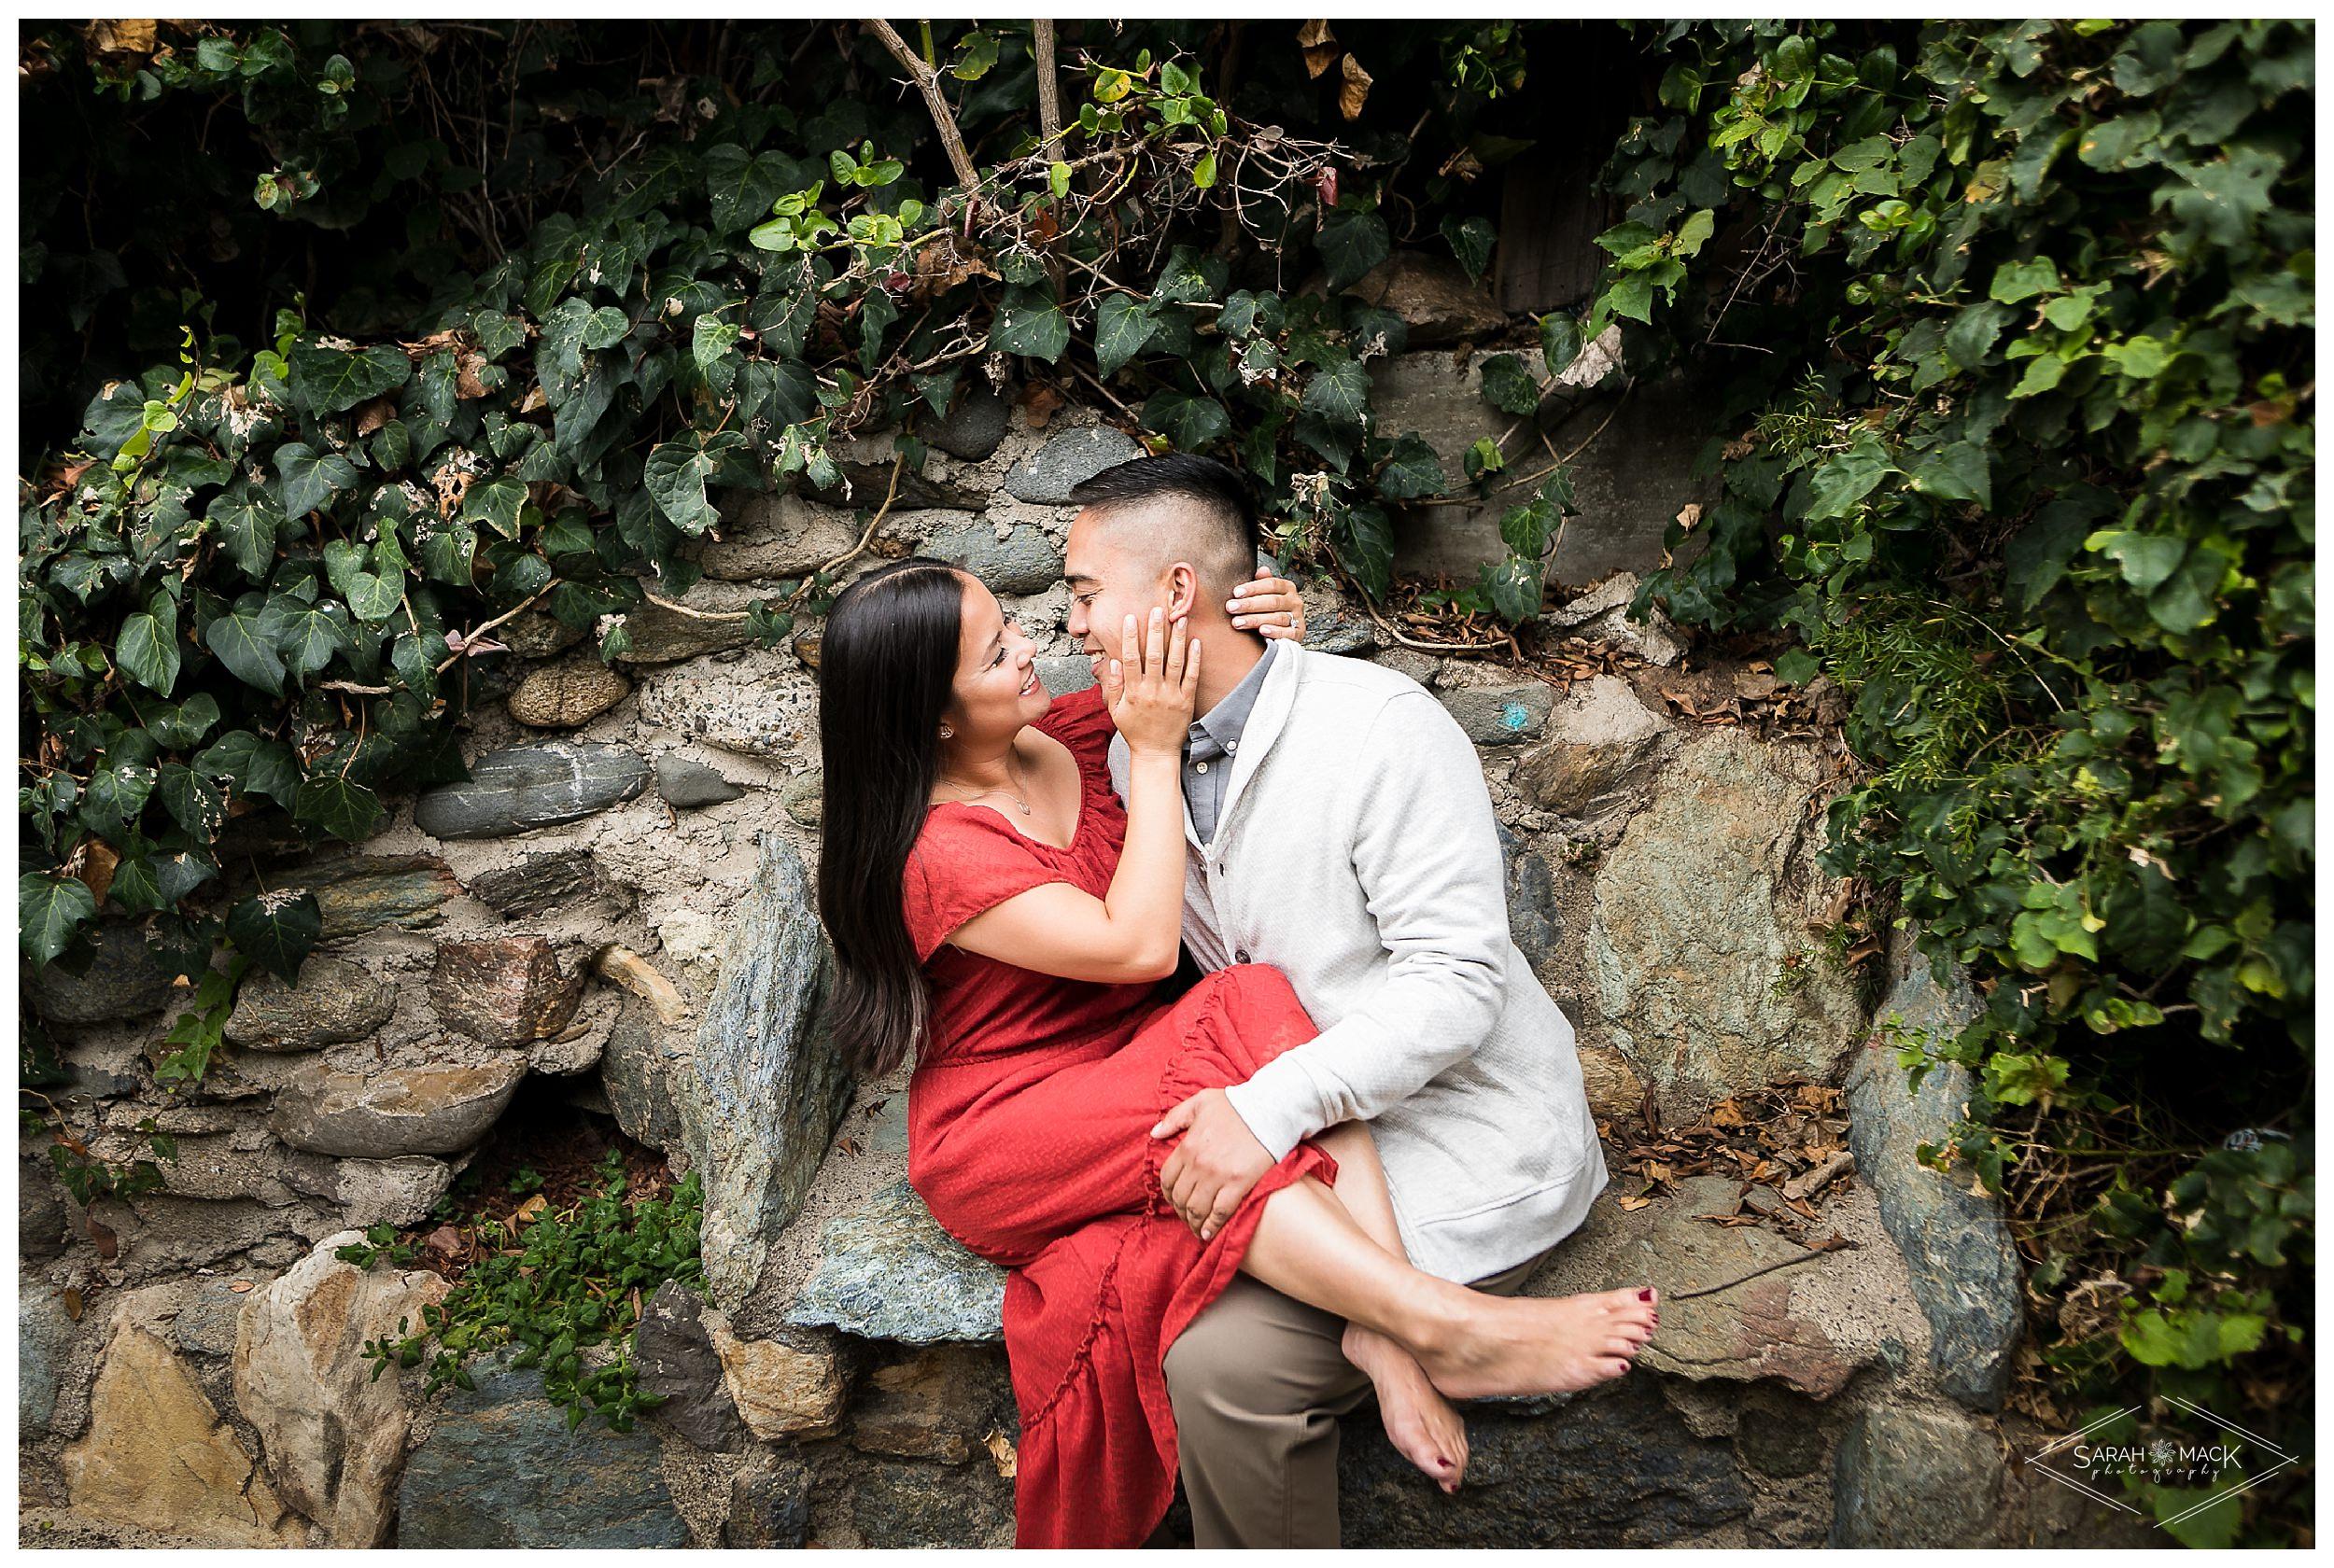 LE_Orange-County-Engagement-Photography 59.jpg